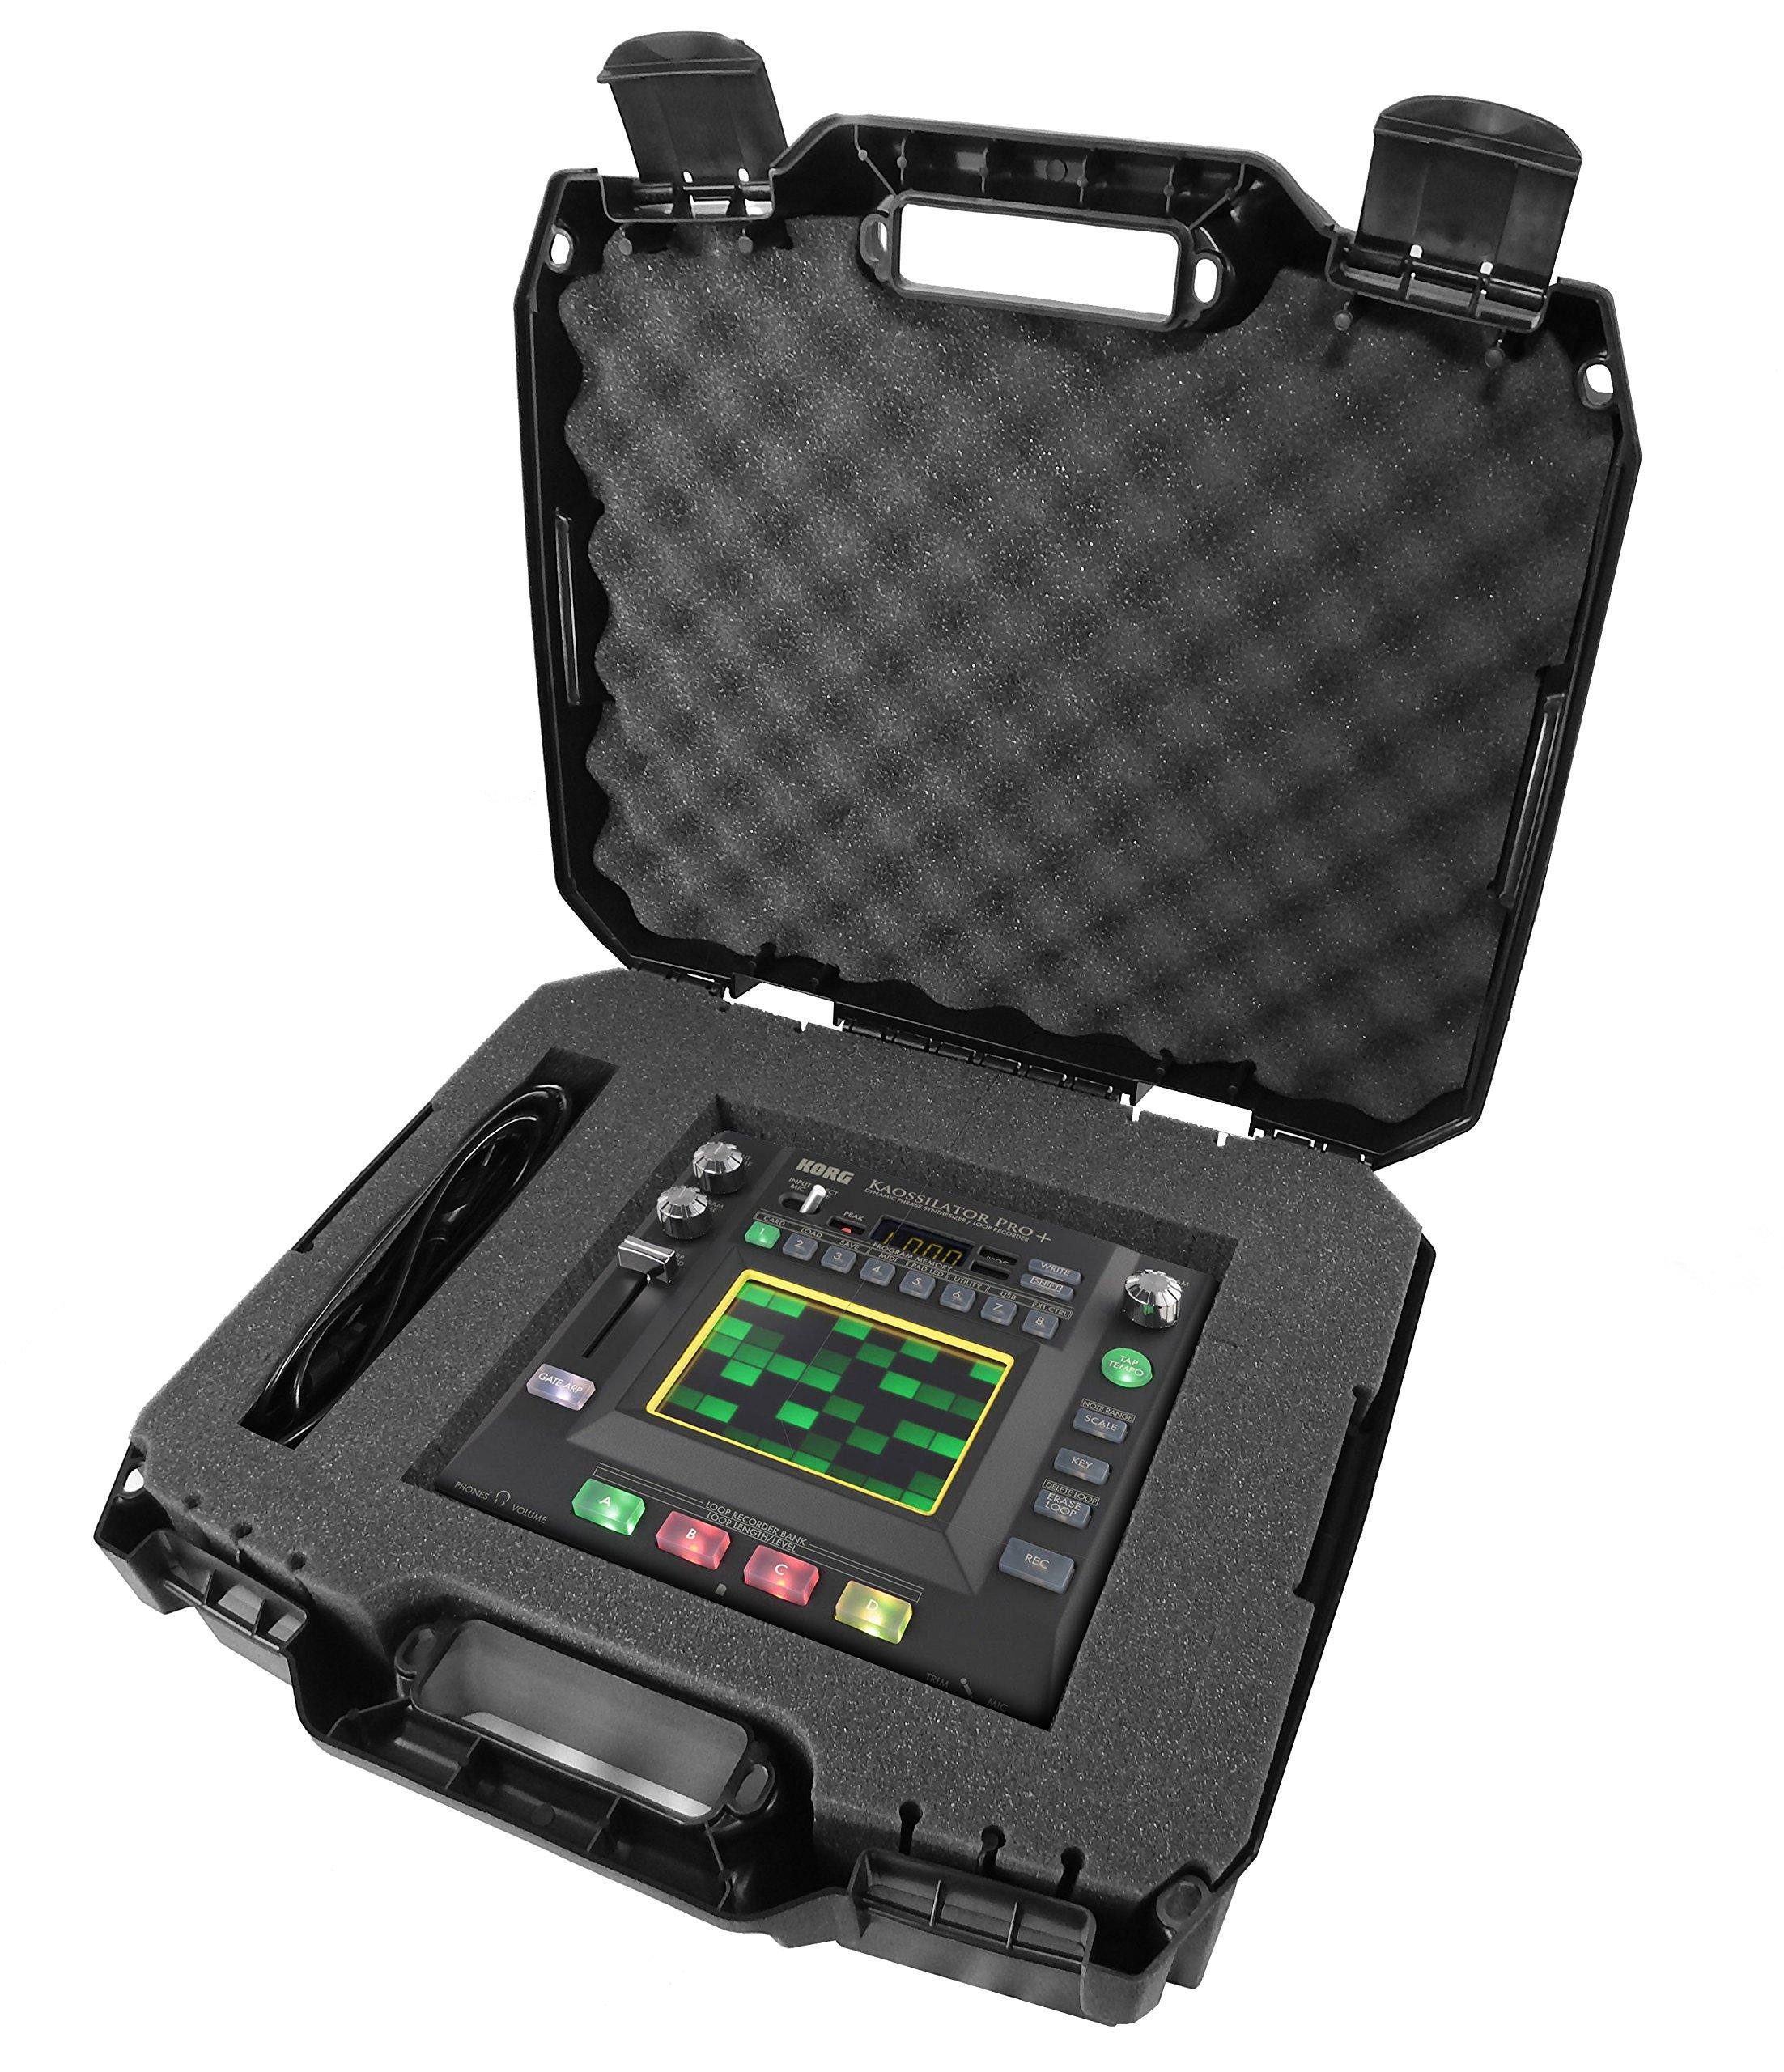 ArmorCASE Travel Carrying Hard Case (17'') for KORG Synthesizer , PAD or Controller - Fits KAOSSILATOR PRO+ , KAOSS DJ , KAOSS PAD KP3+ , KAOSS PAD QUAD , electribe , electribe sampler , padKONTROL by CASEMATIX